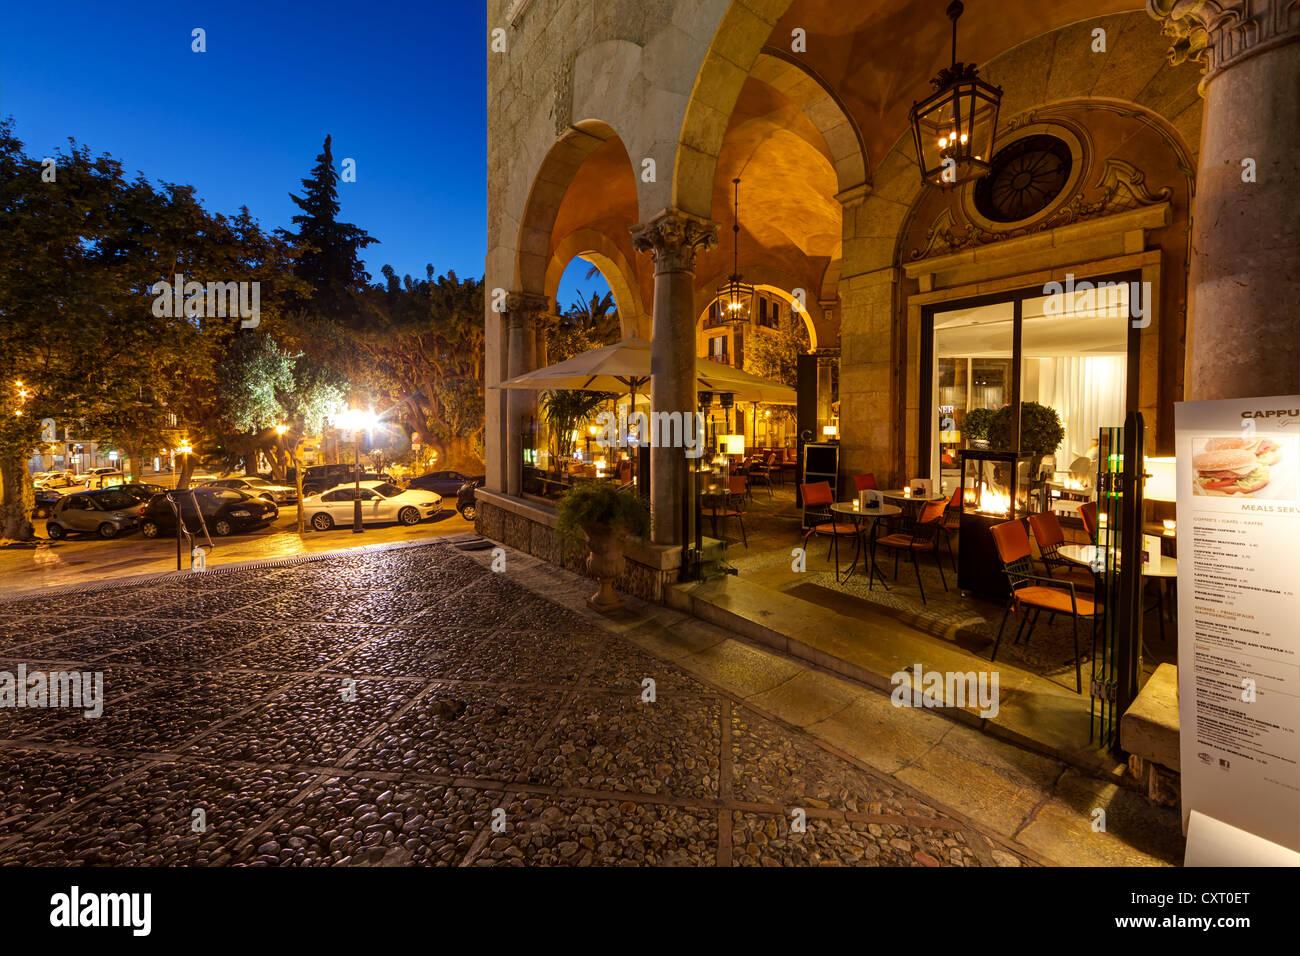 Restaurant at the Royal Palace, old town, Ciutat Antiga, Palma de Mallorca, Majorca, Balearic Islands, Spain, Europe - Stock Image